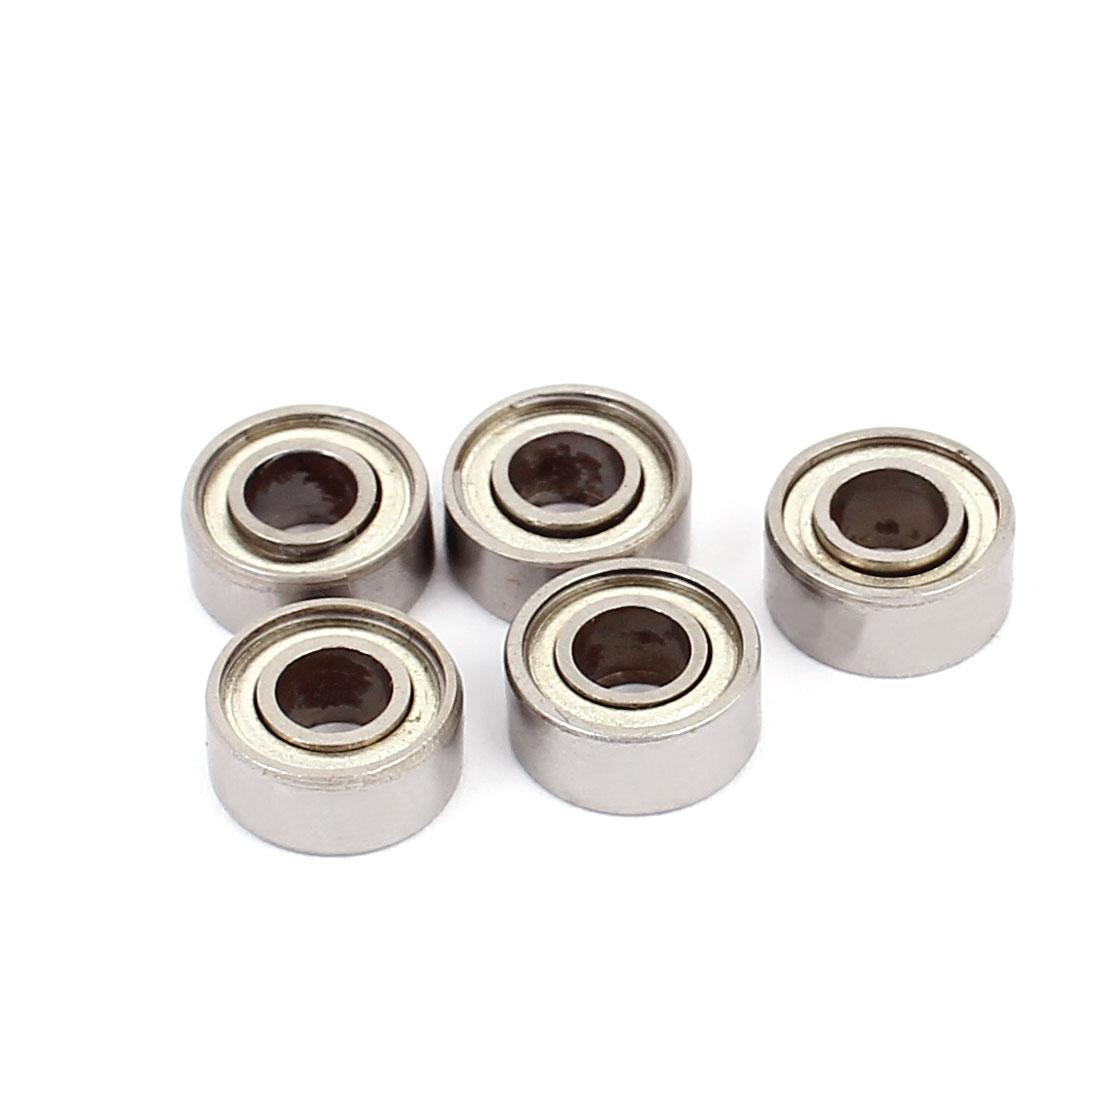 684ZZ Double Shielded Deep Groove Ball Bearings Silver Tone 9mmx4mmx4mm 5pcs